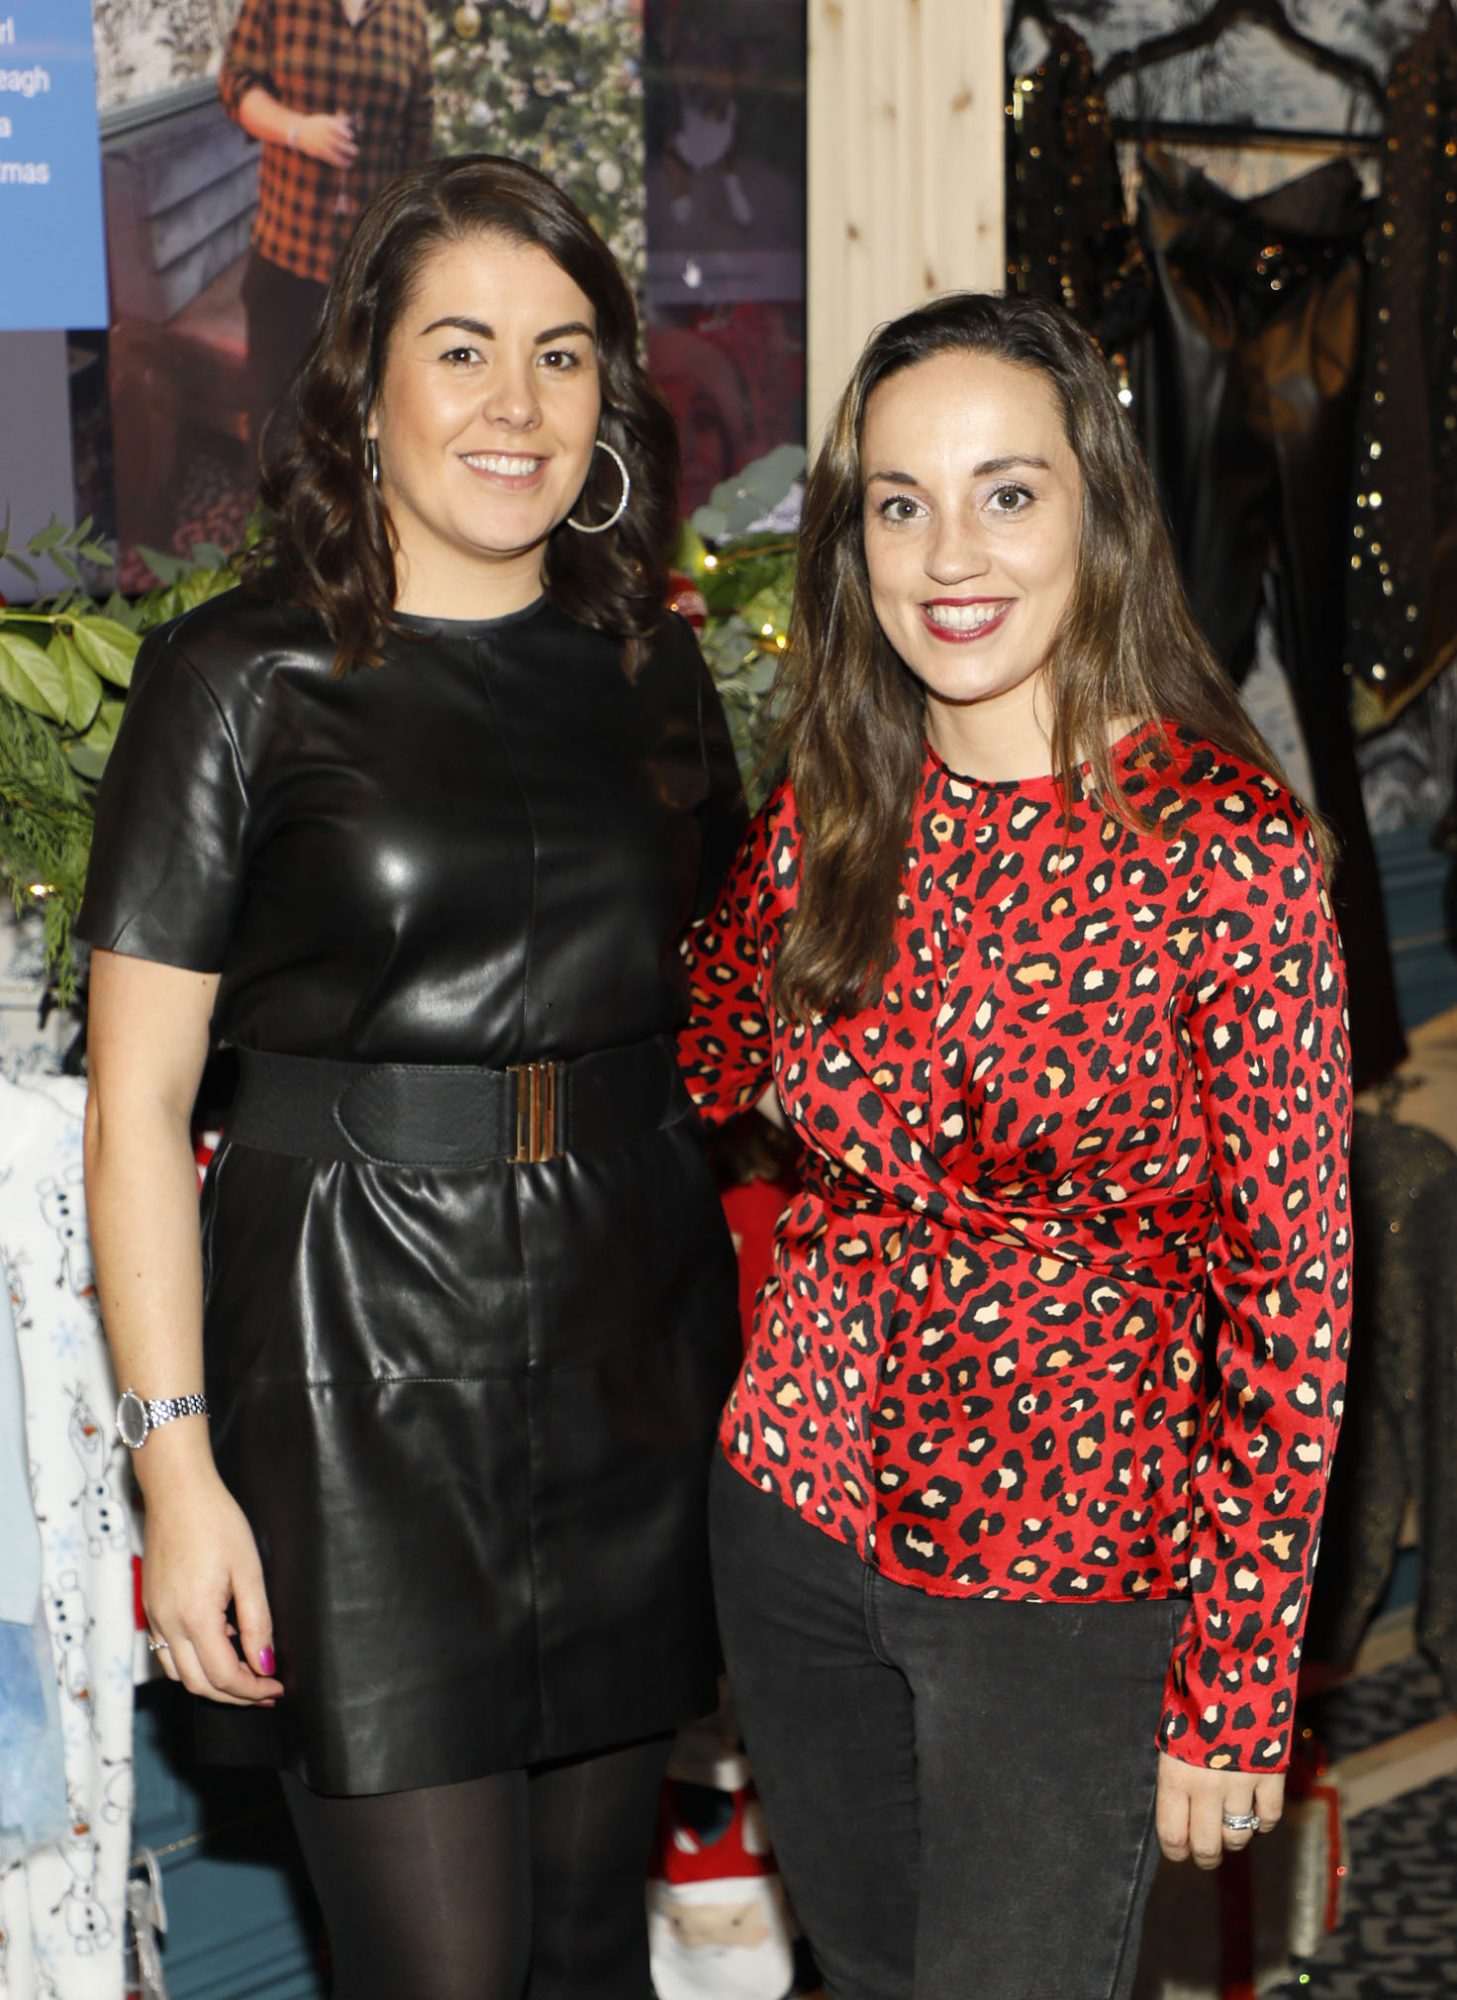 Sue Shiels and Kelly Felton at the Tesco 2019 Christmas Showcase in Dublin's Iveagh Garden Hotel.  Photo: Kieran Harnett